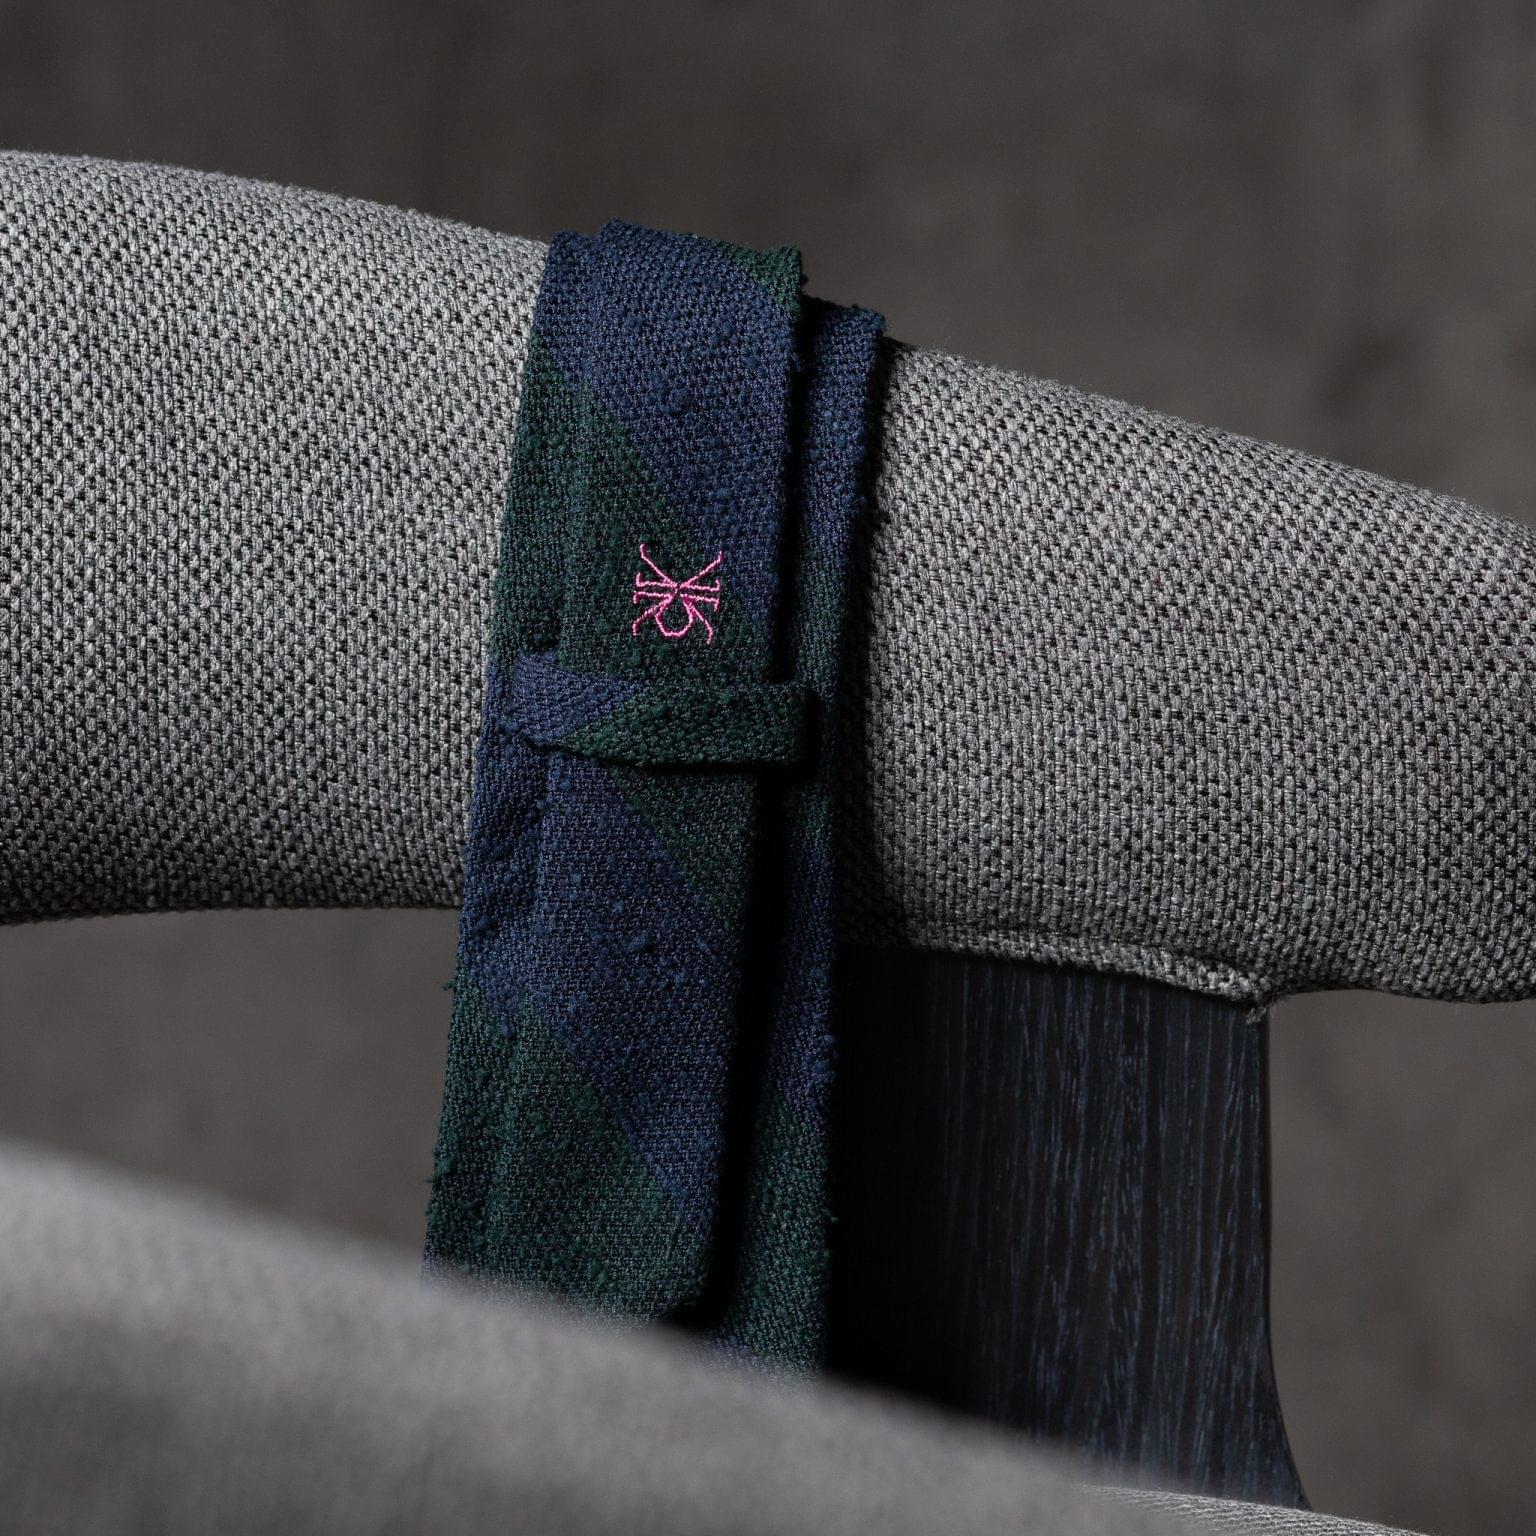 SHANTUNG-0271-Tie-Initials-Corbata-Iniciales-The-Seelk-4